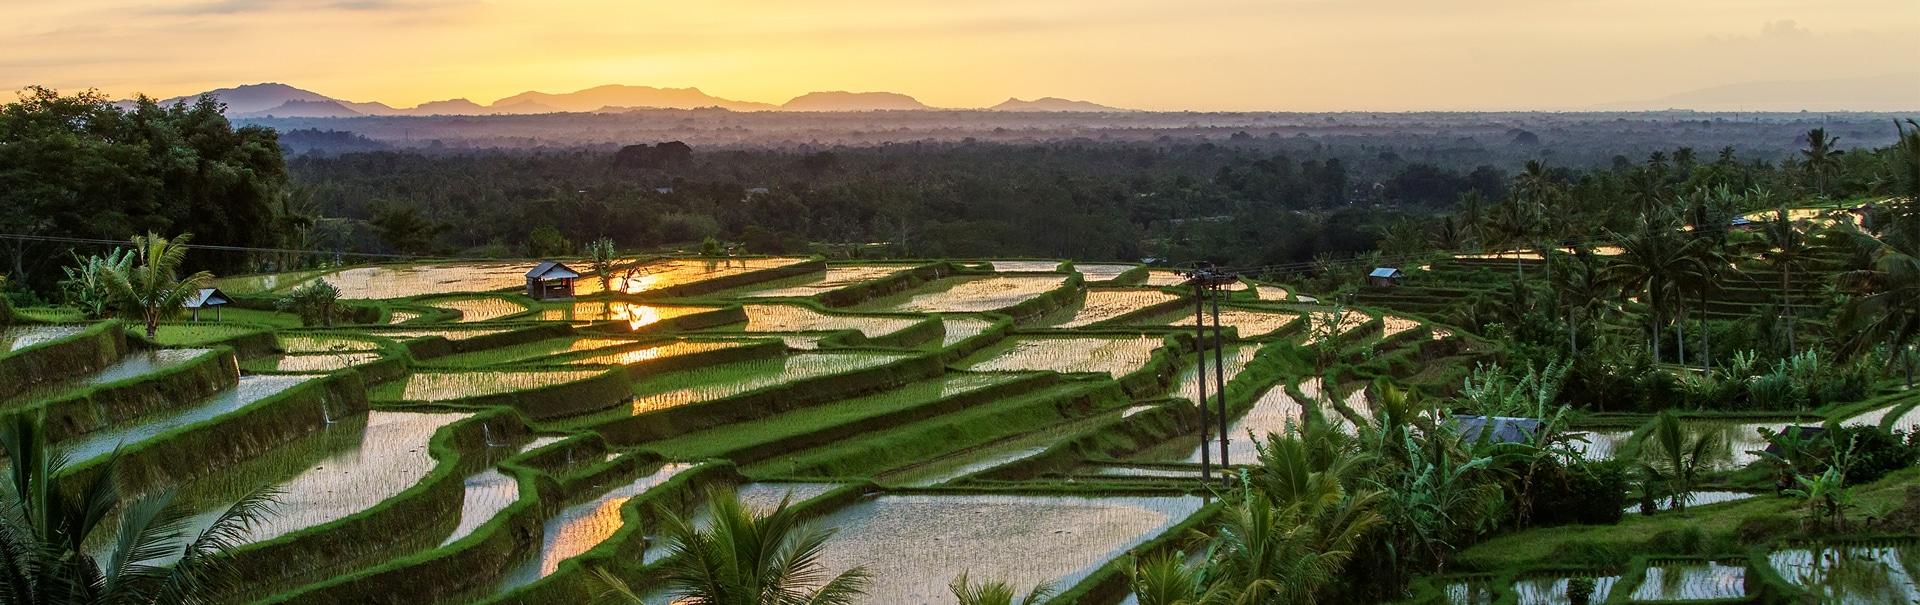 Bali Extravaganza (SHIB8) Banner